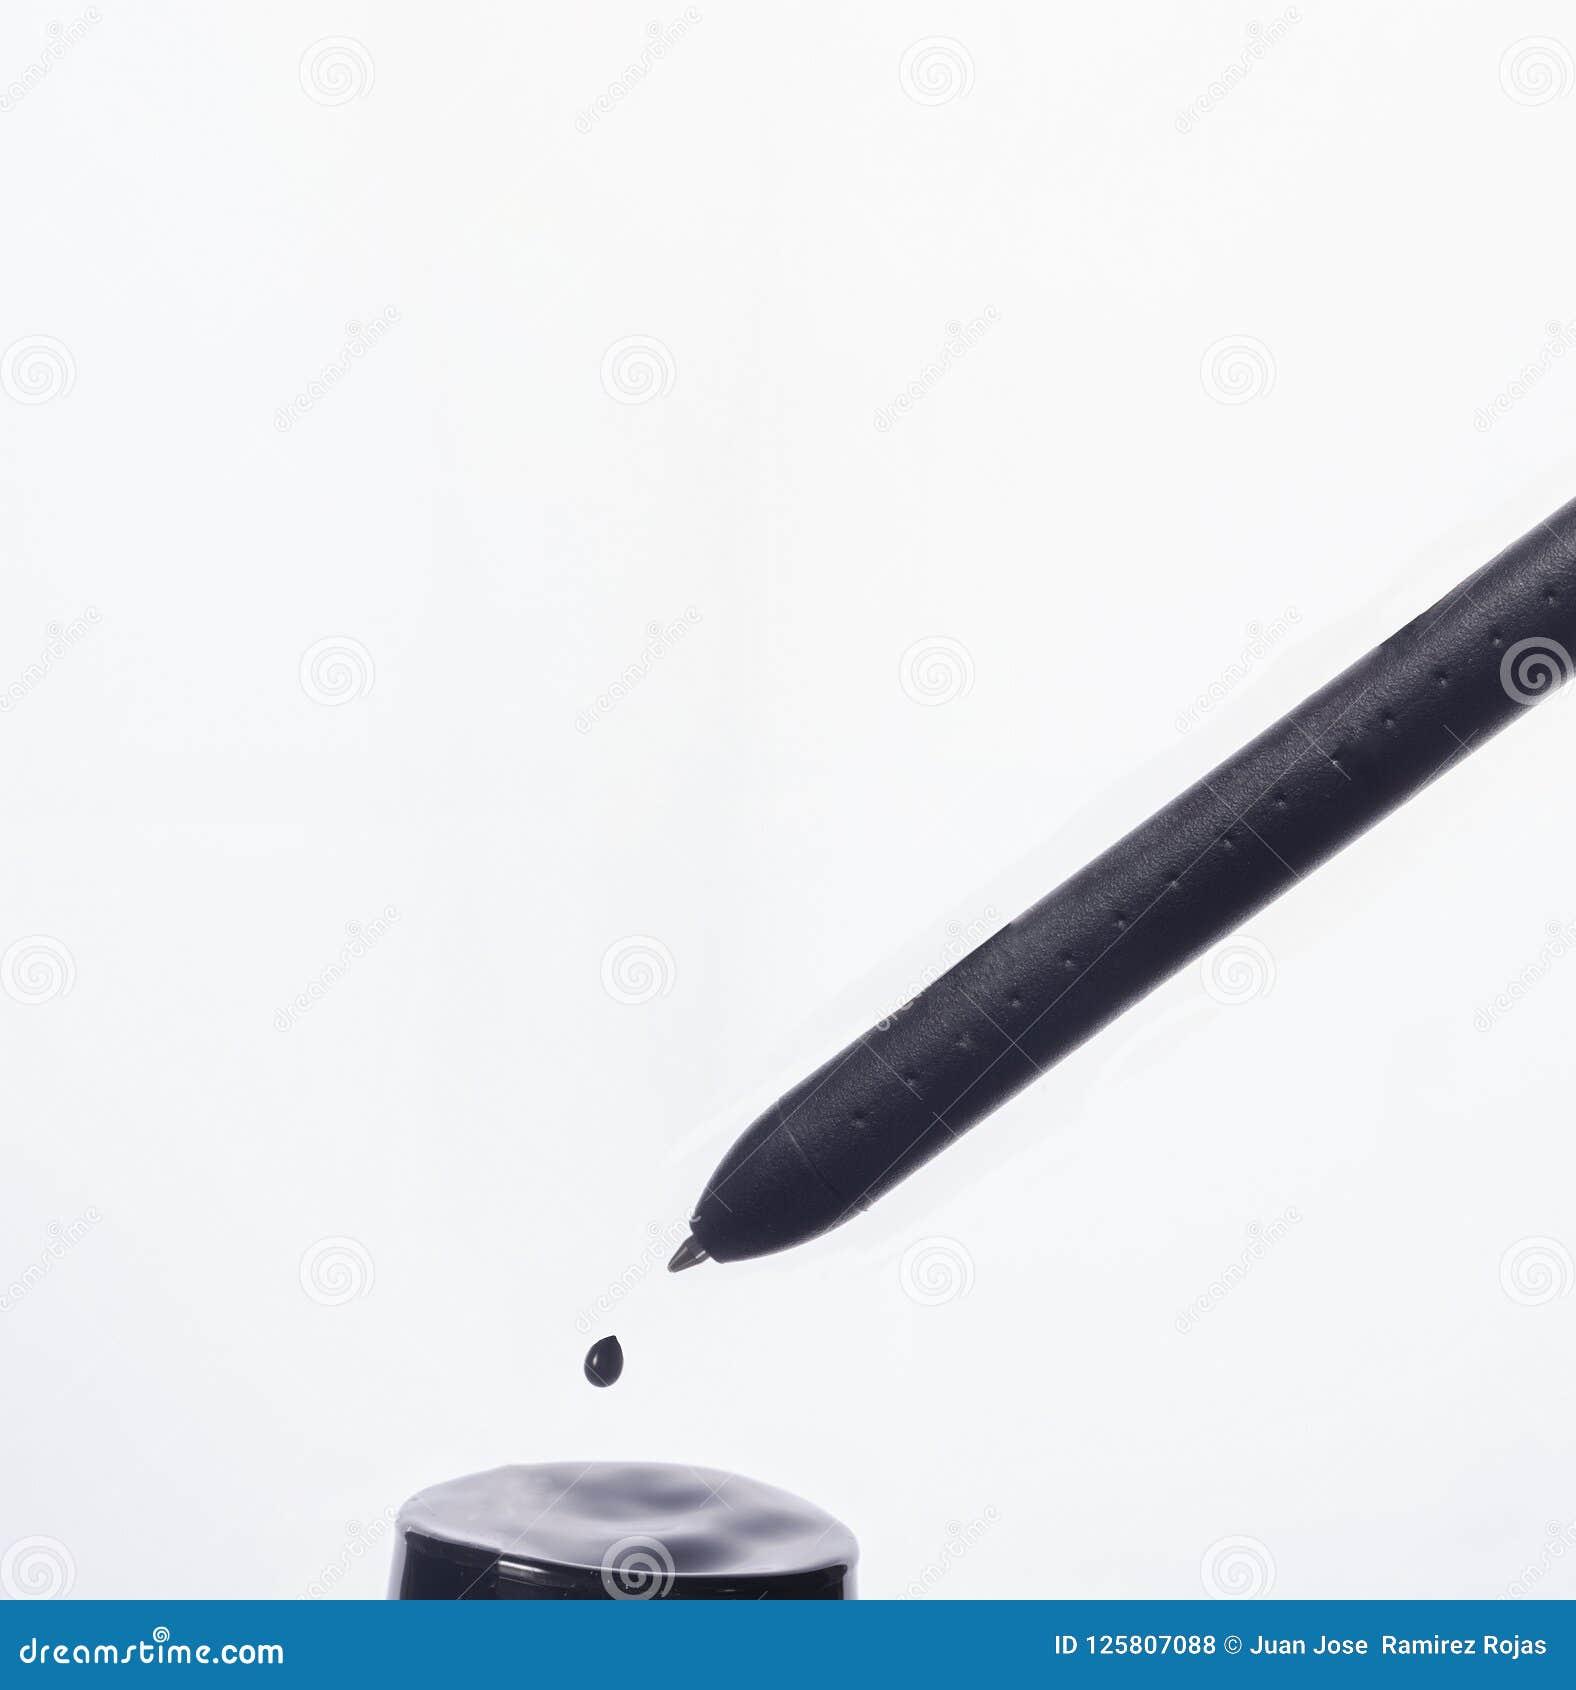 Penna nera su fondo bianco